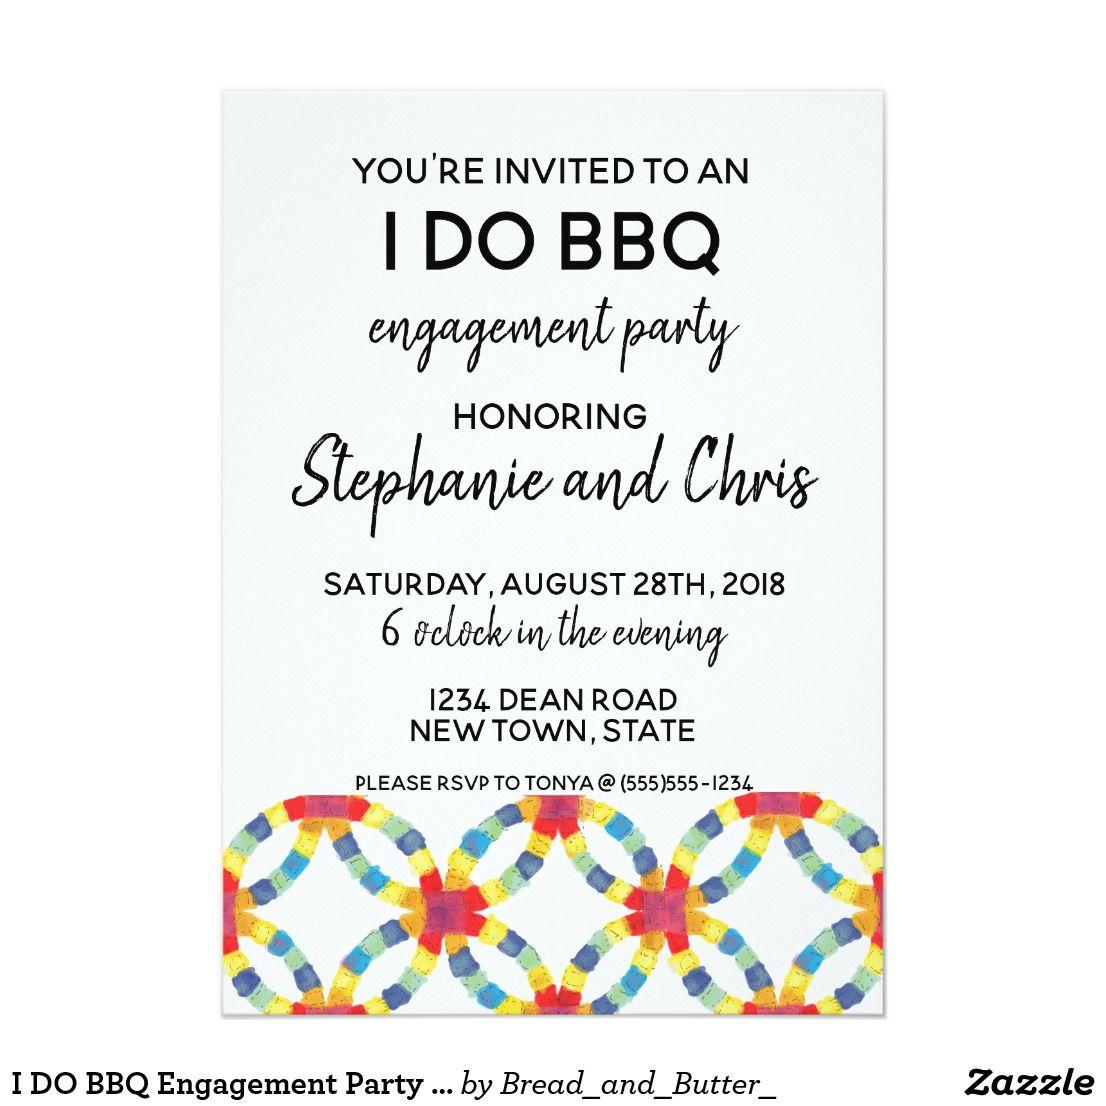 I DO BBQ Engagement Party Invitation | Zazzle | Pinterest ...